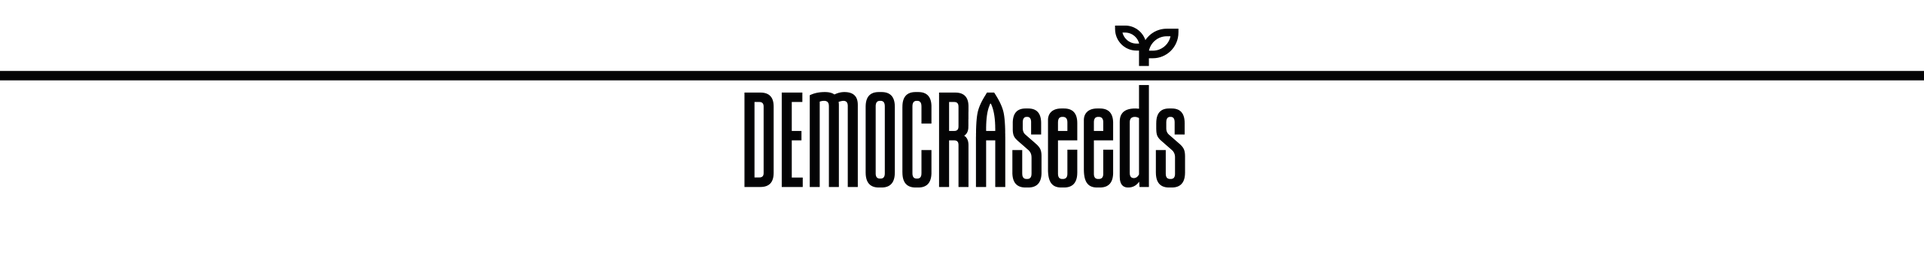 DEMOCRASEEDS_LONGO1.png